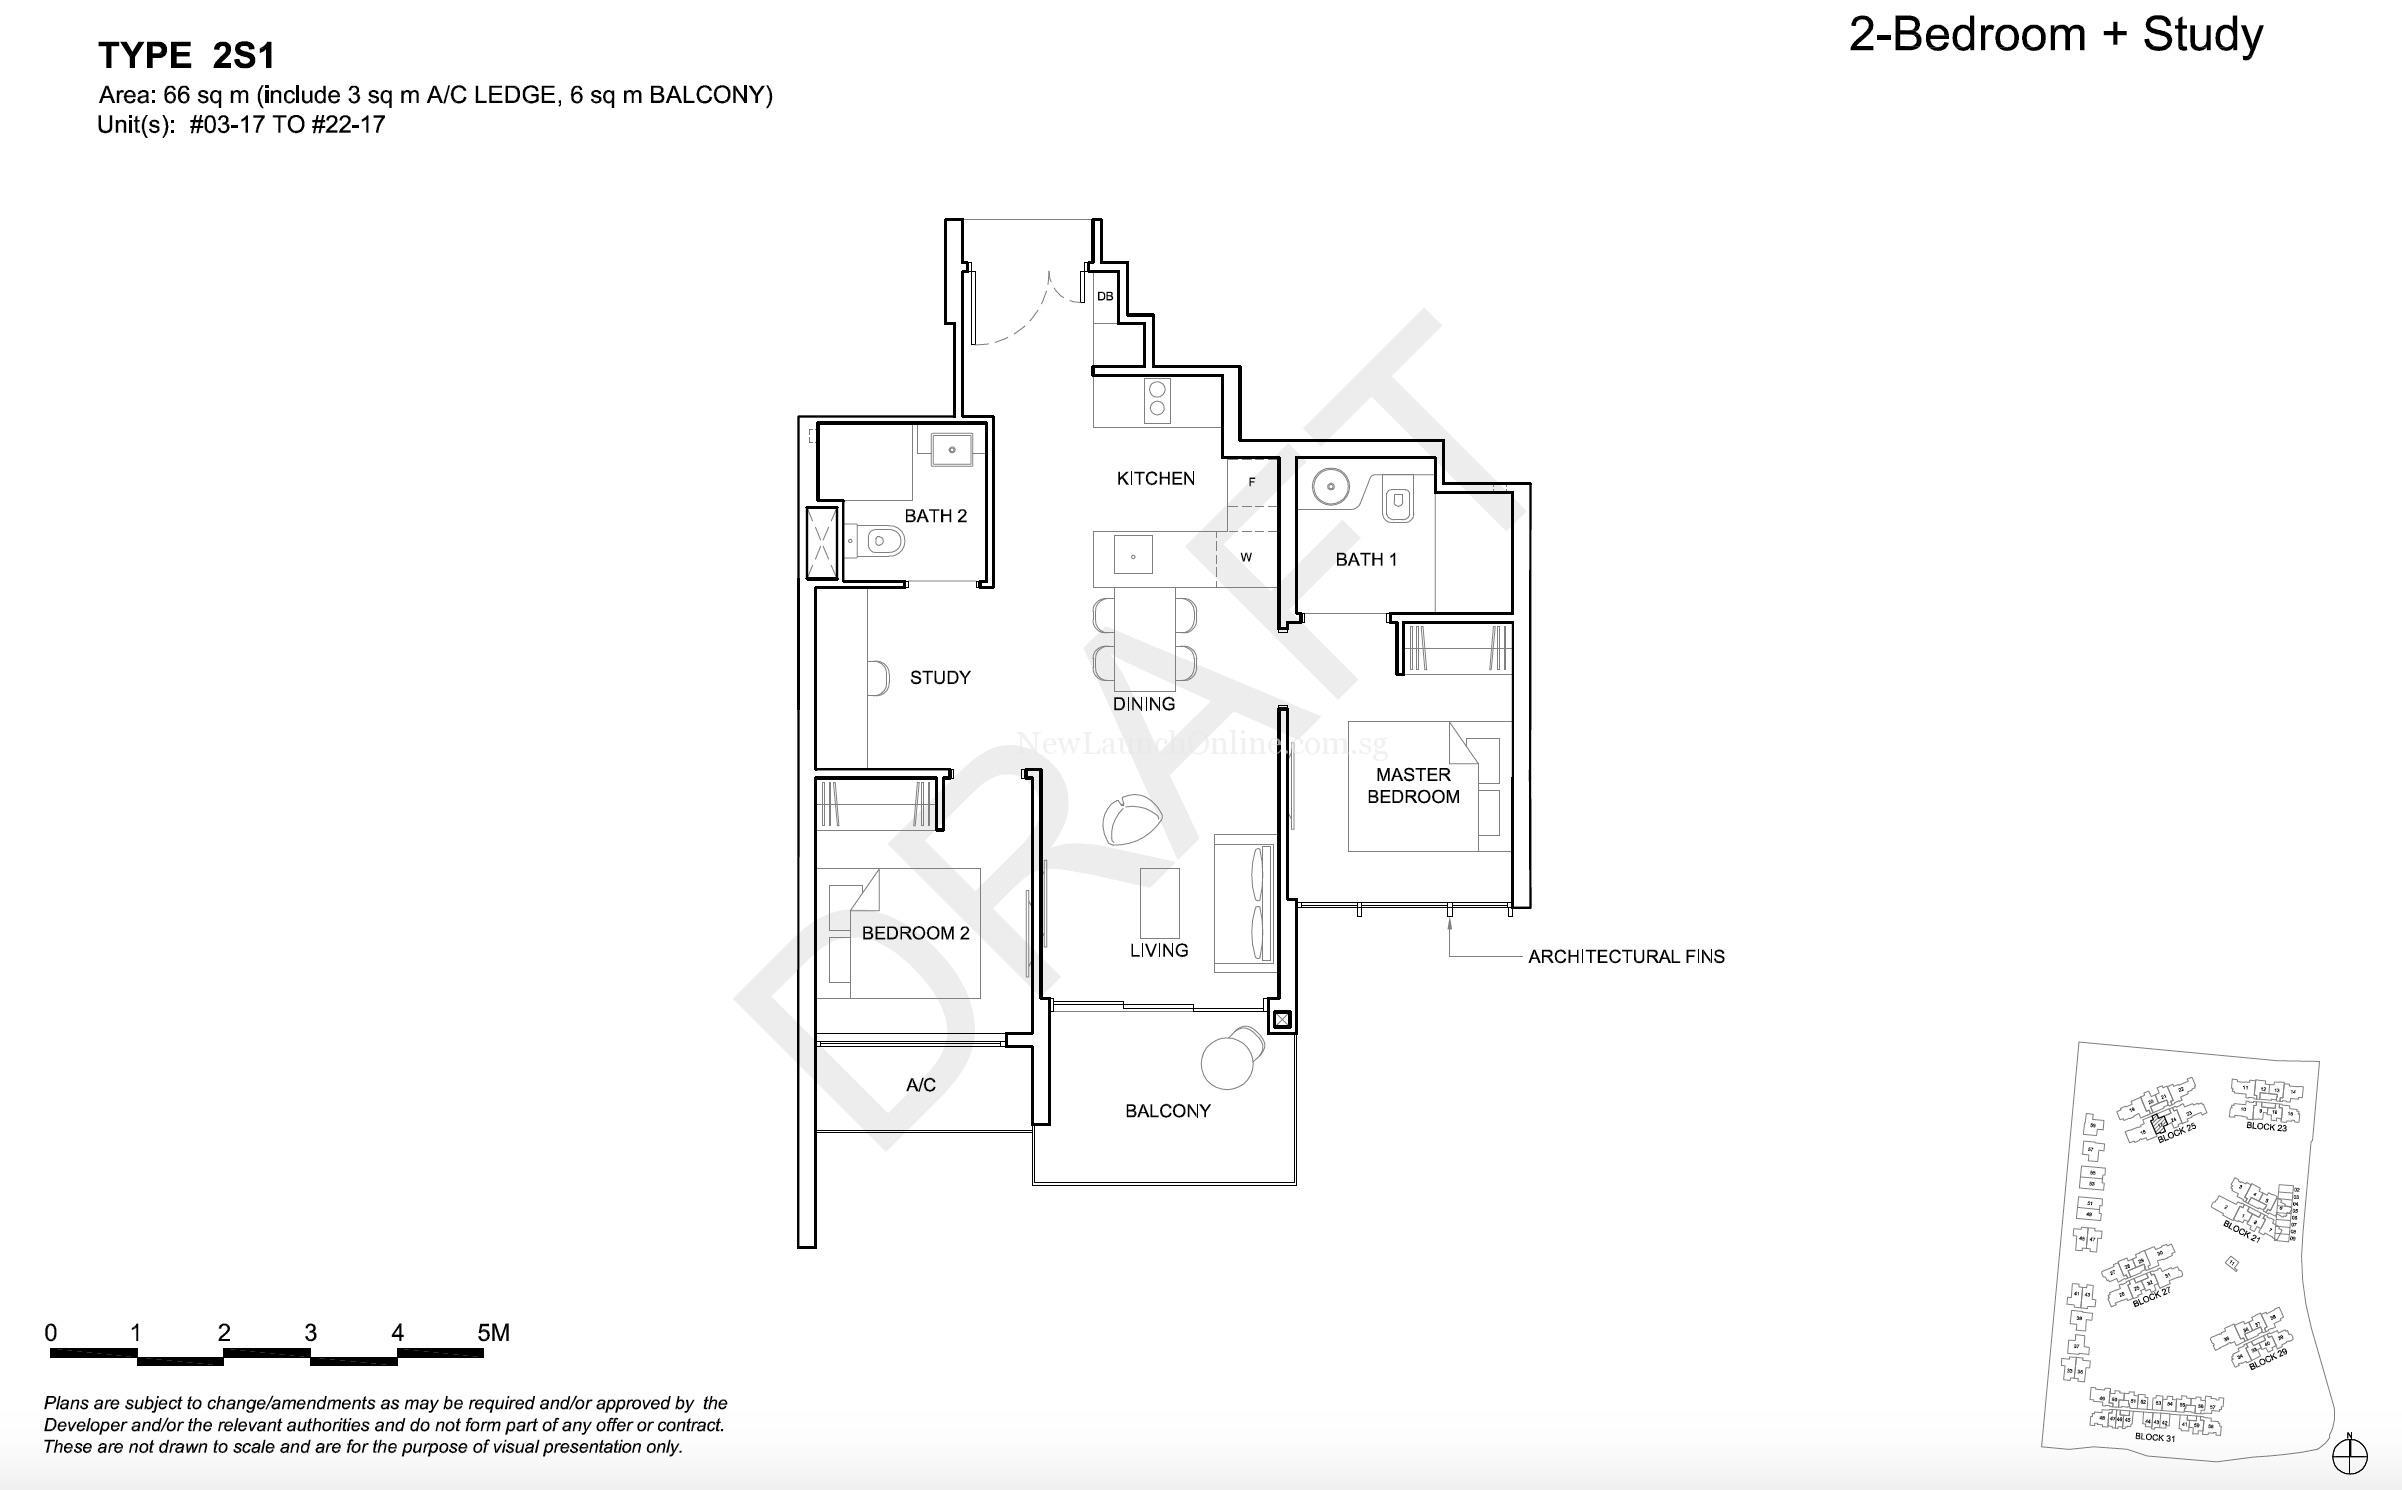 High Park Residences Floor Plan - 2 bedroom + Study Type ...